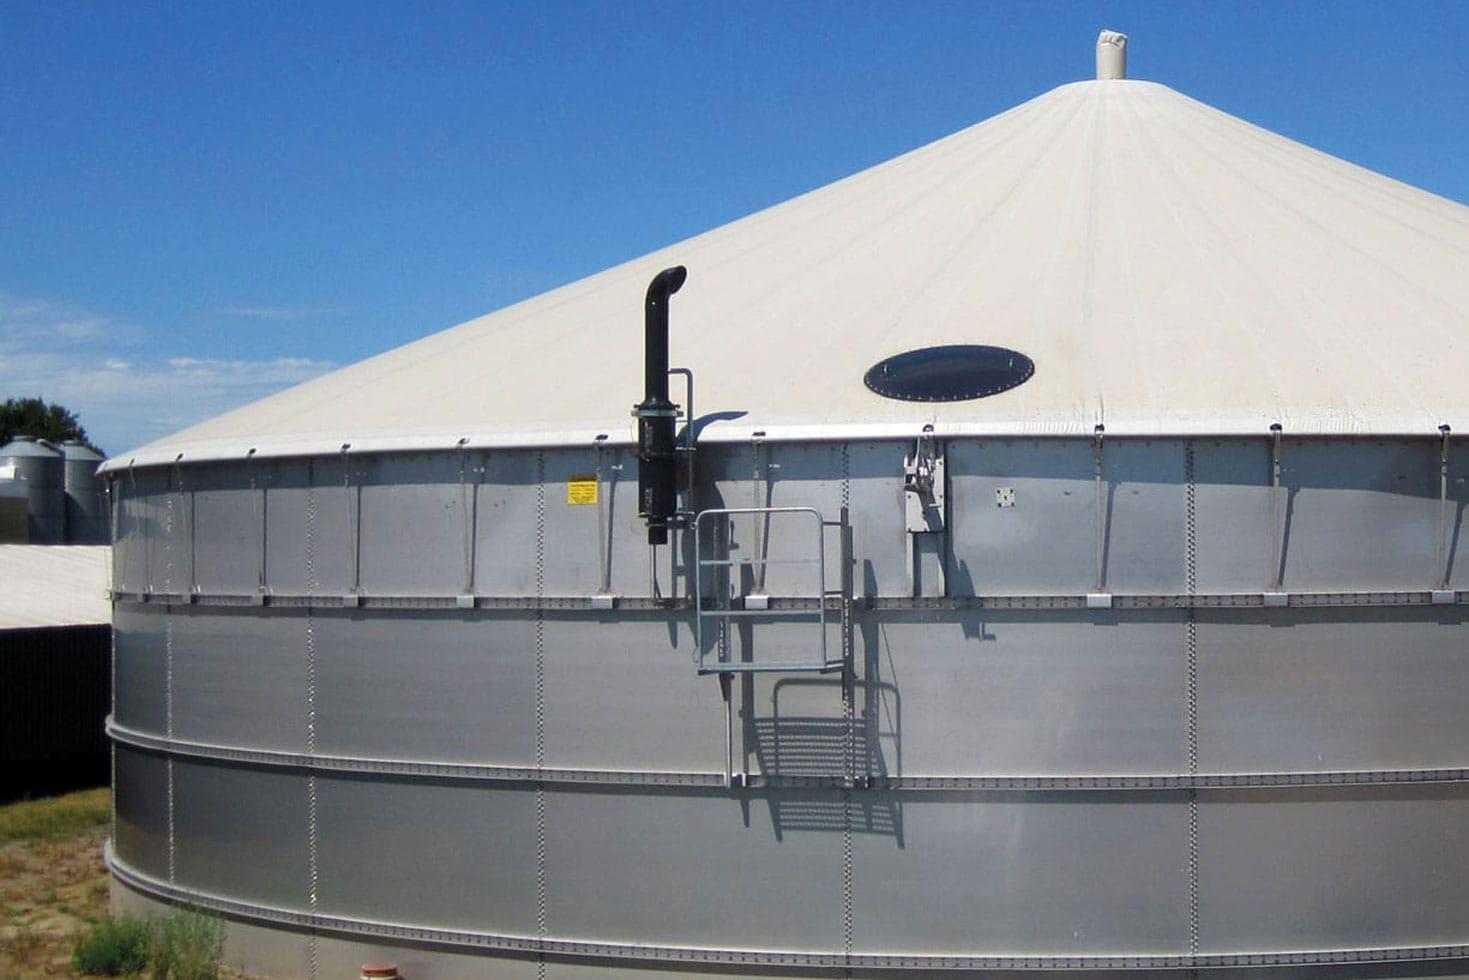 HSR-B – High Silo Roof (Biogas)